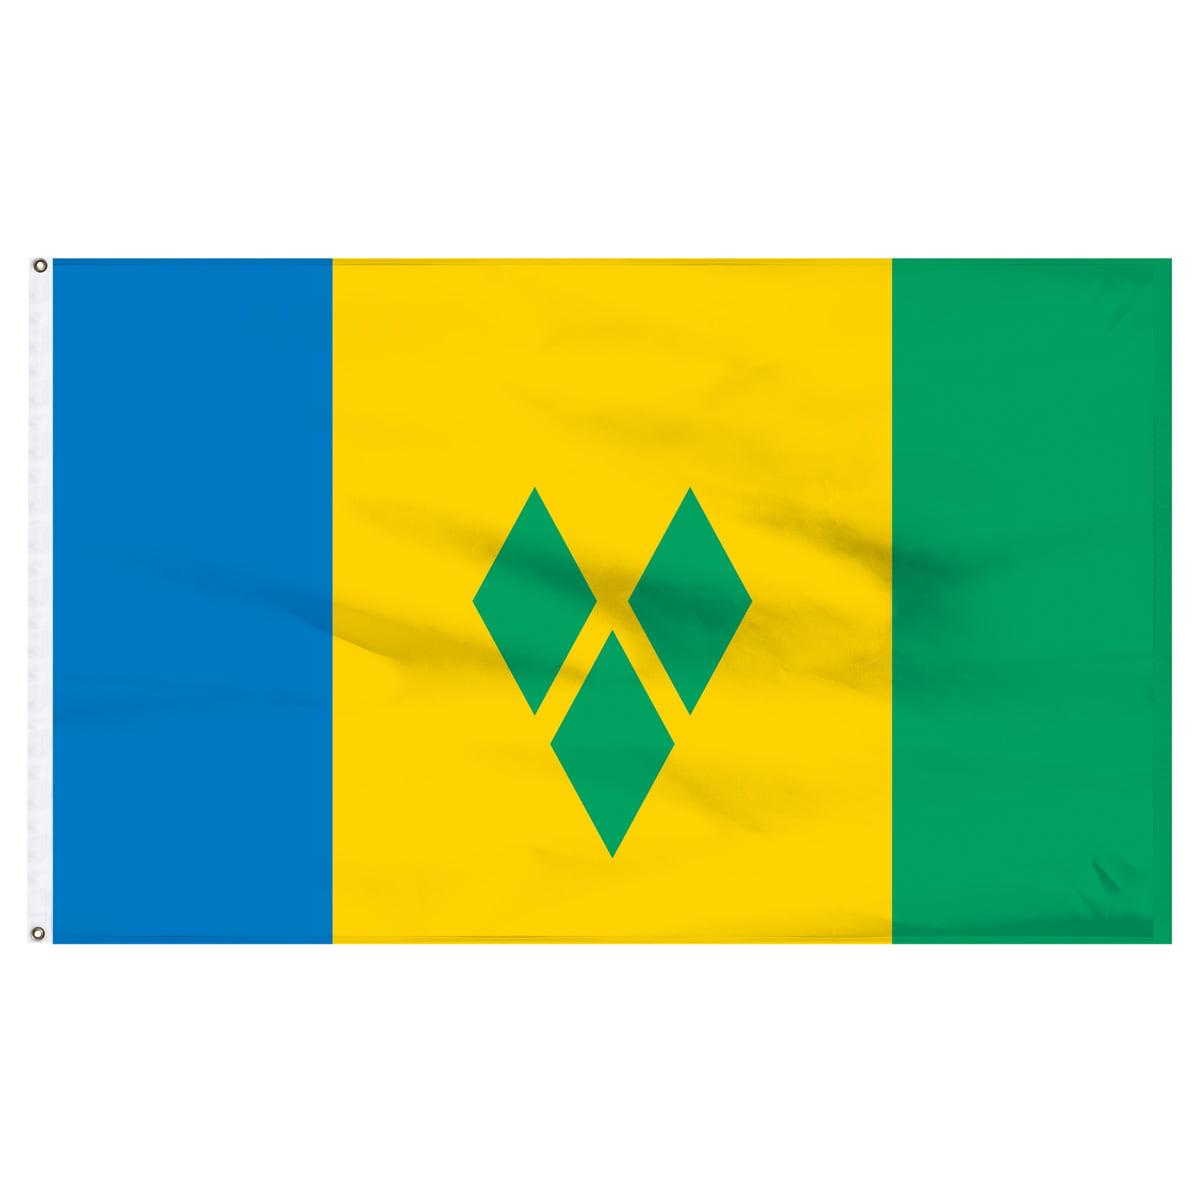 St. Vincent and the Grenadines 3ft x 5ft Nylon Flag